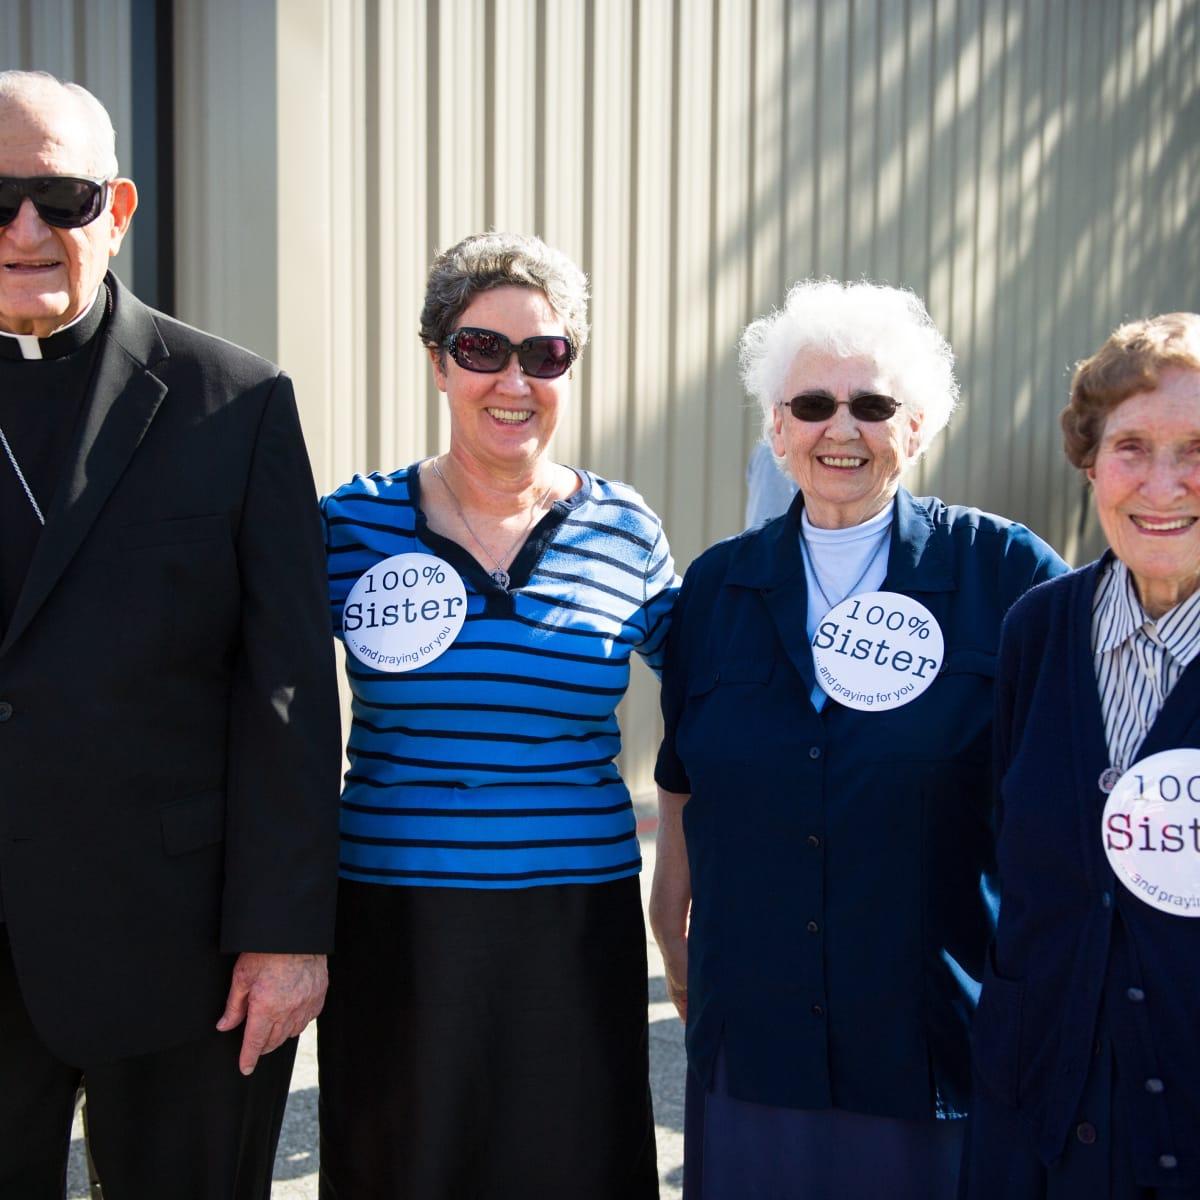 Christus Nun Run Archbishop Emeritus Joseph Fiorenza, Sister Kevina Keating and Sisters of Charity of the Incarnate Word